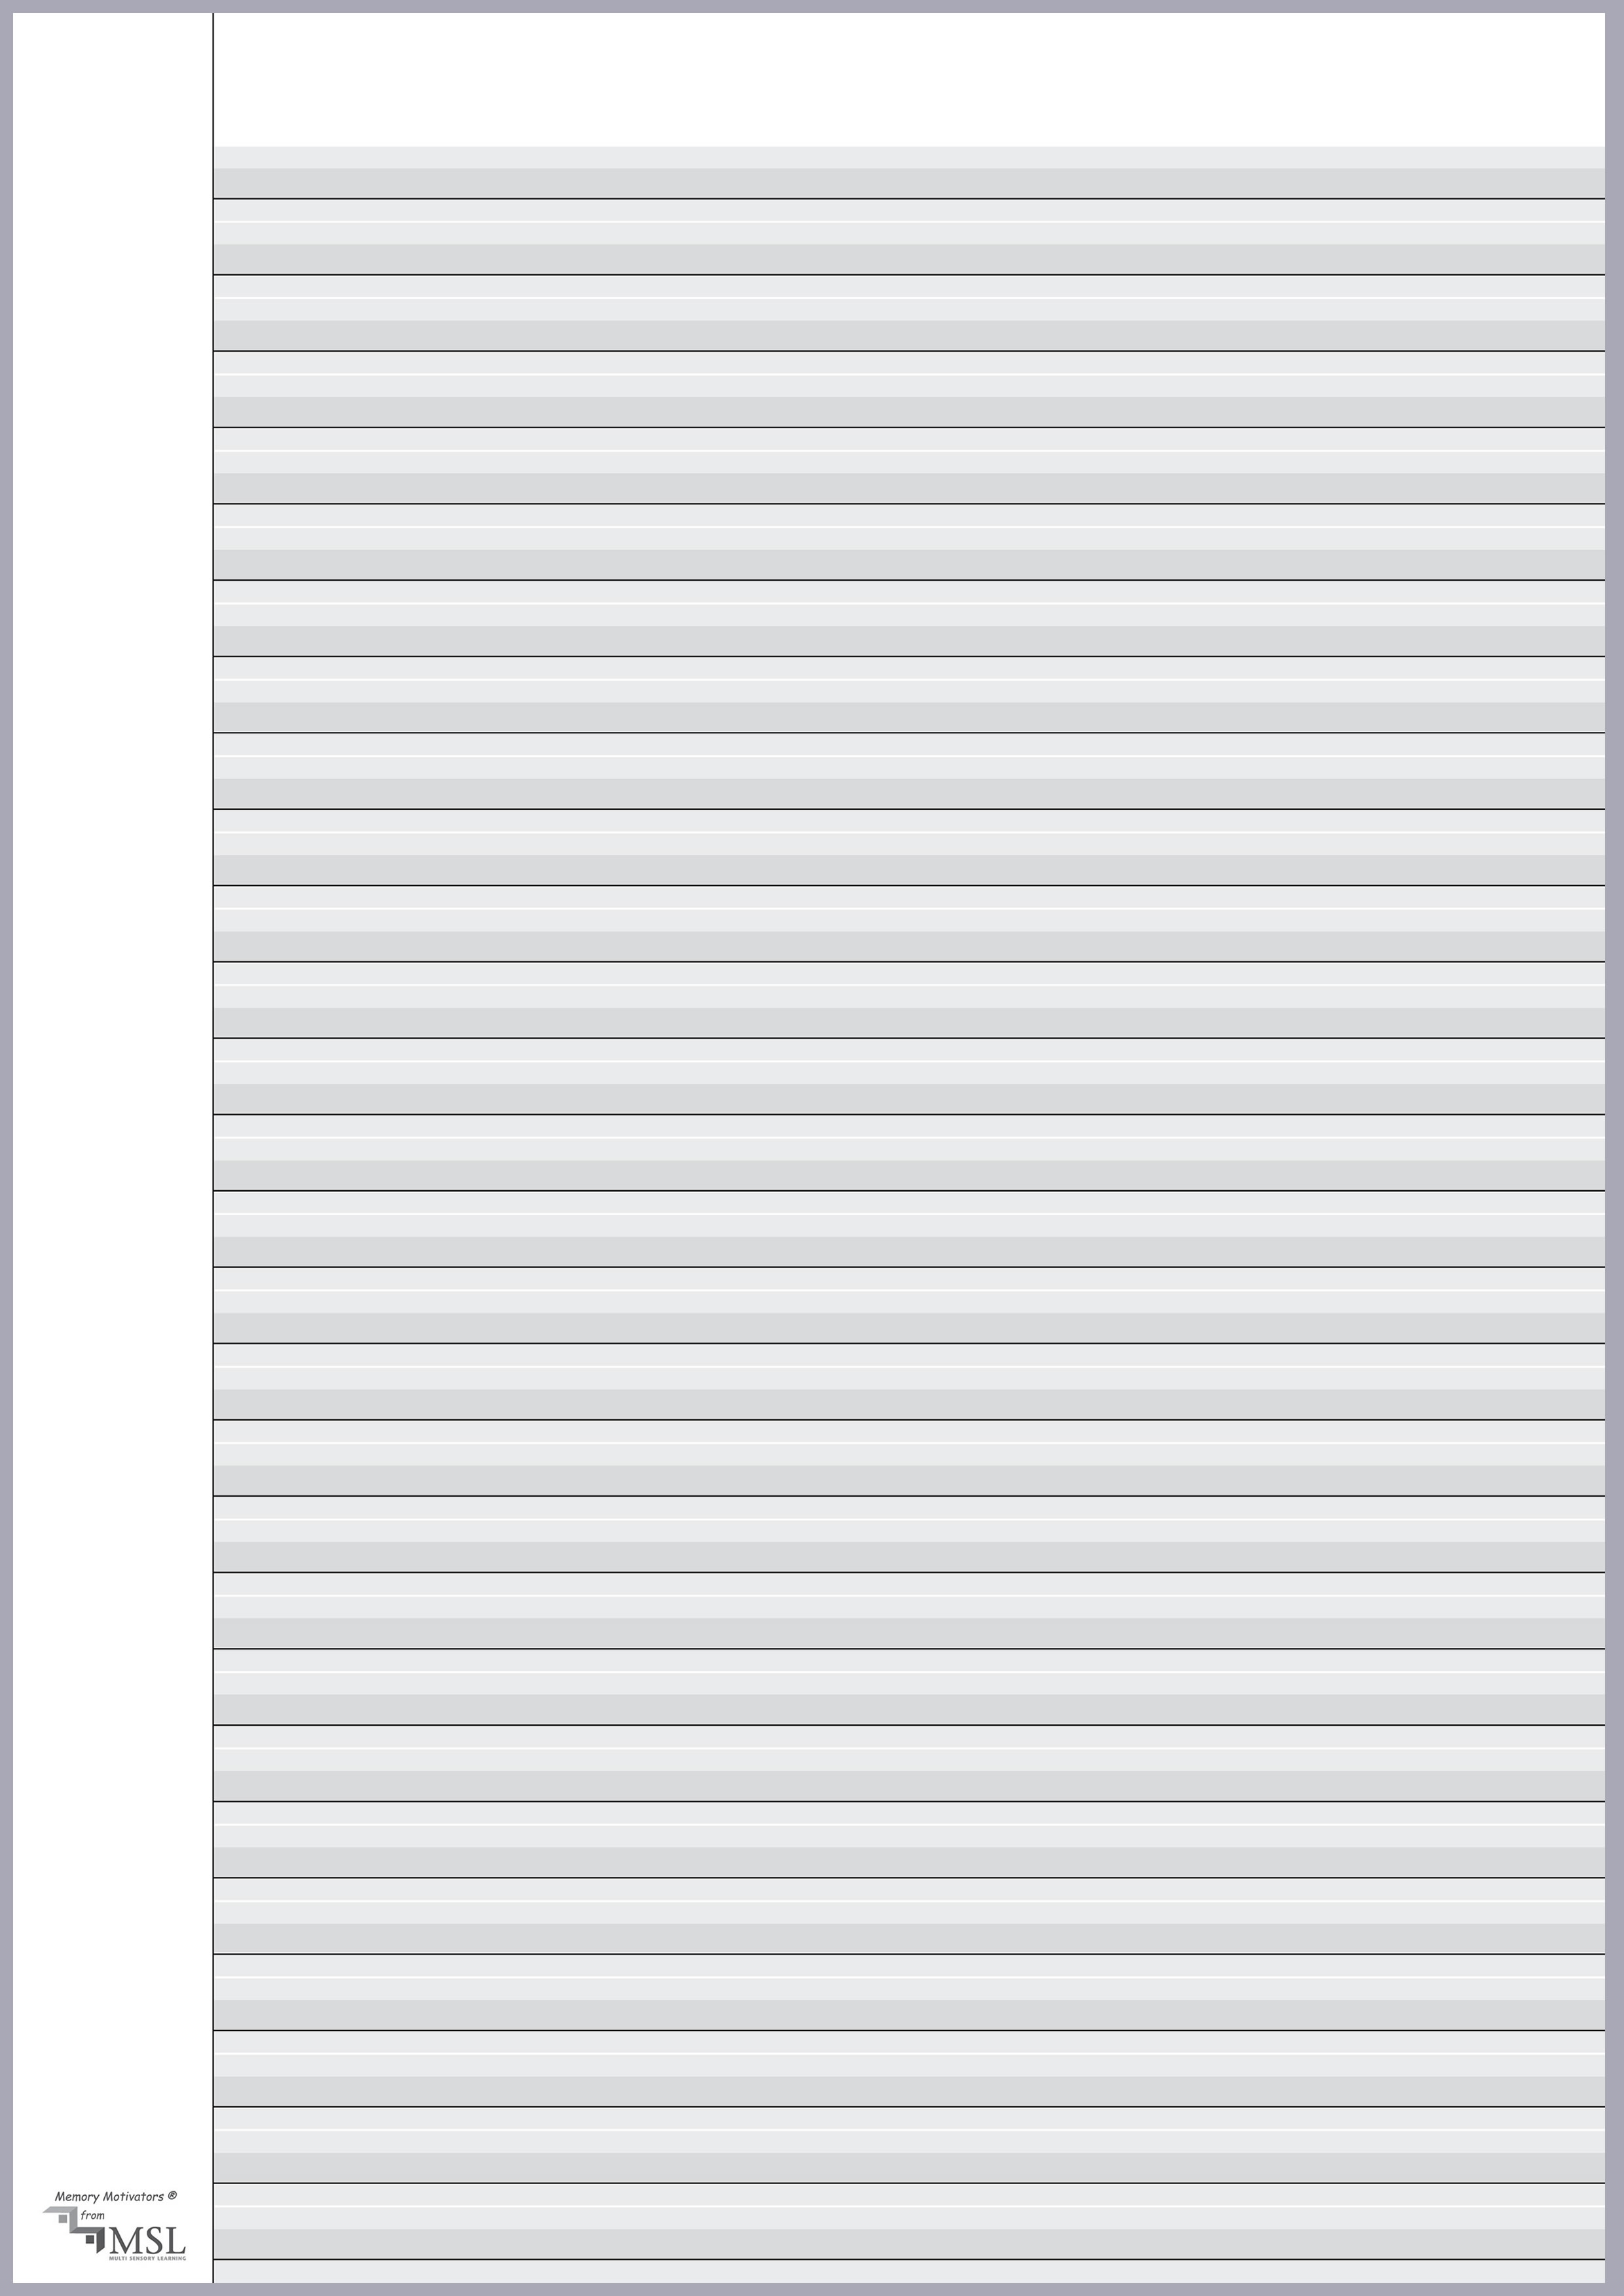 Cursive Handwriting Guidelines A4 Sheet Master